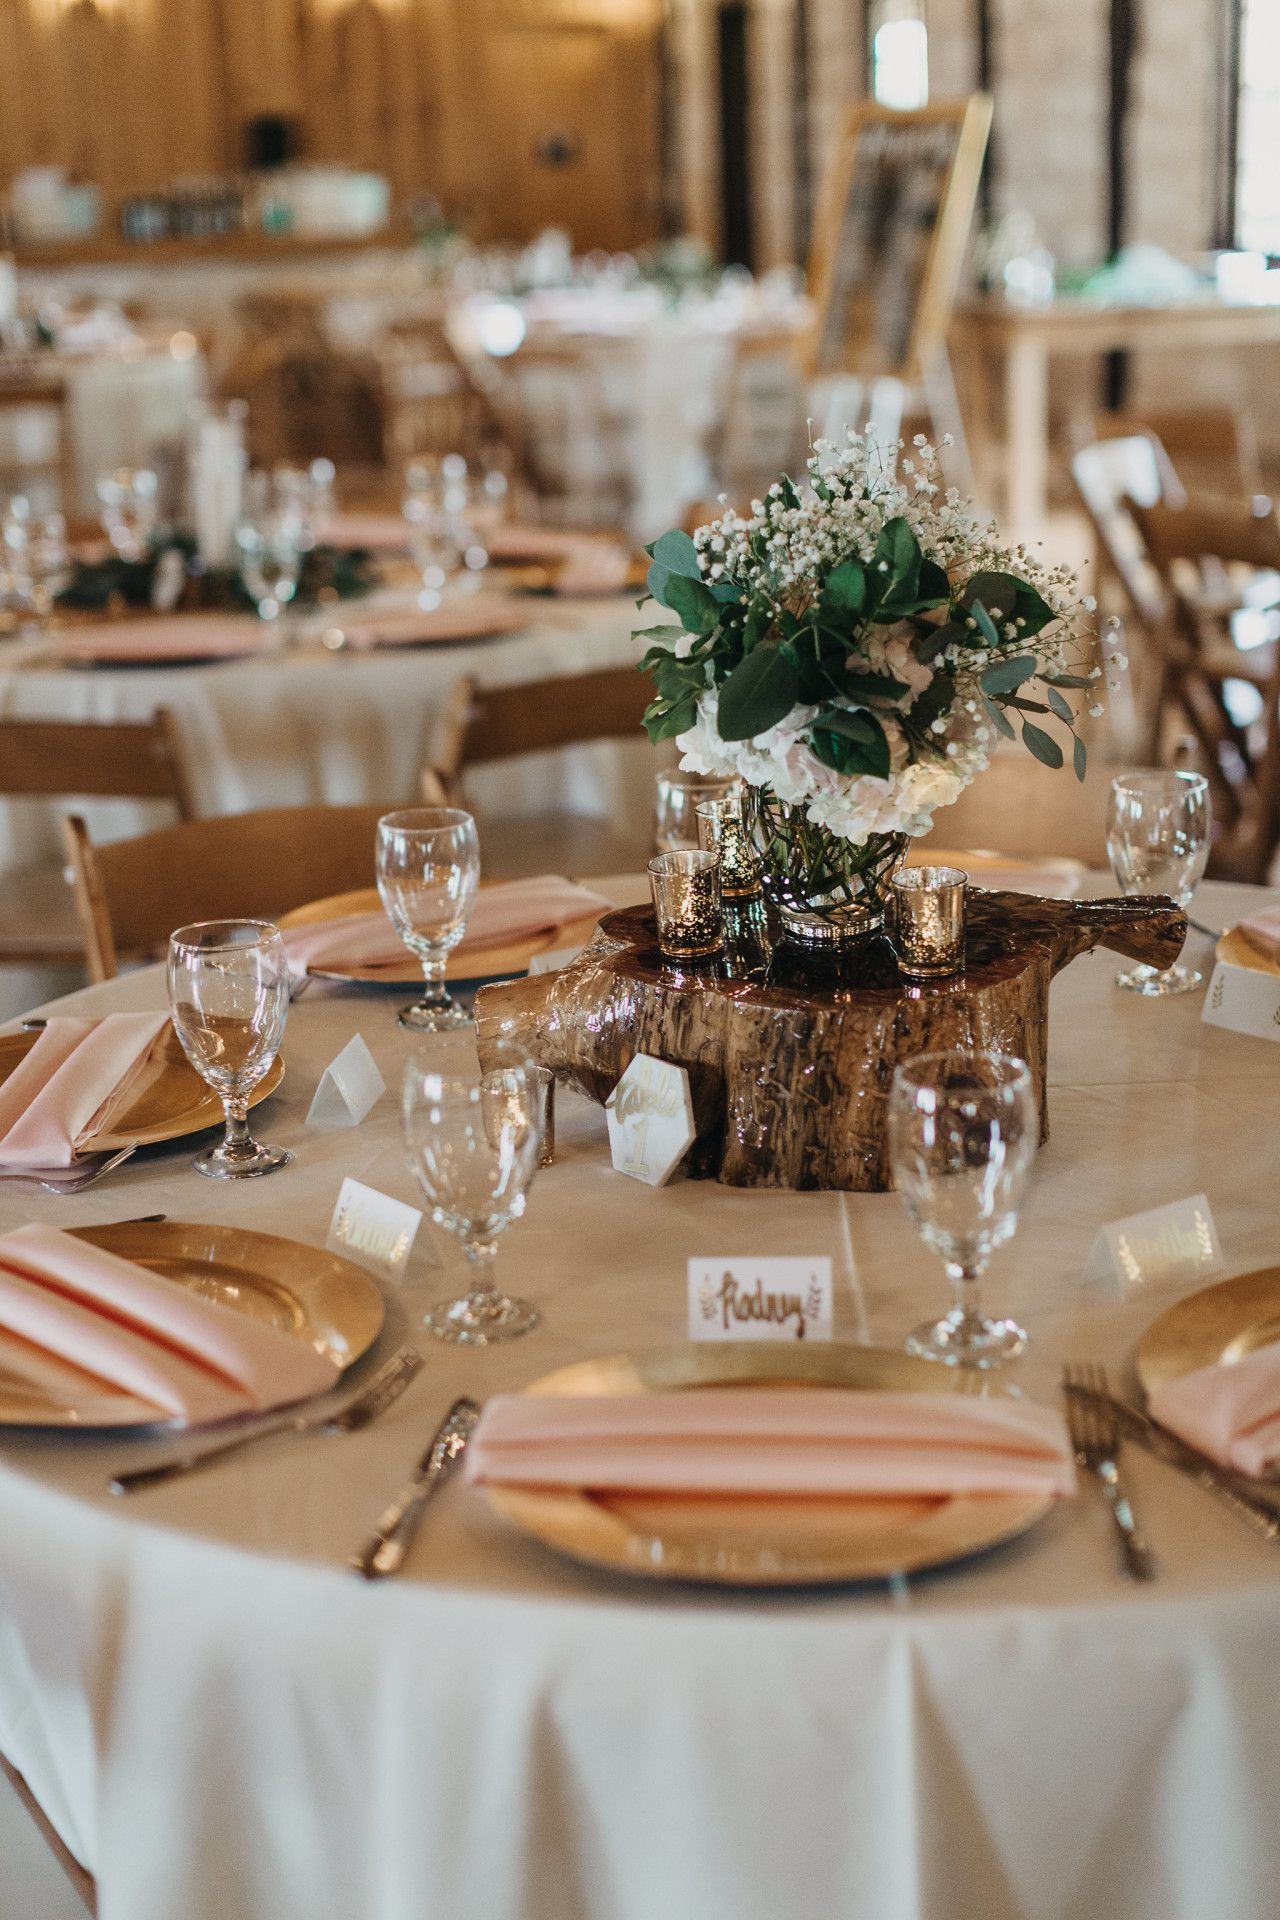 Simple Wedding Reception Table Decorations Ideas In 2020 Country Wedding Table Decoration Reception Table Decorations Natural Wedding Decor